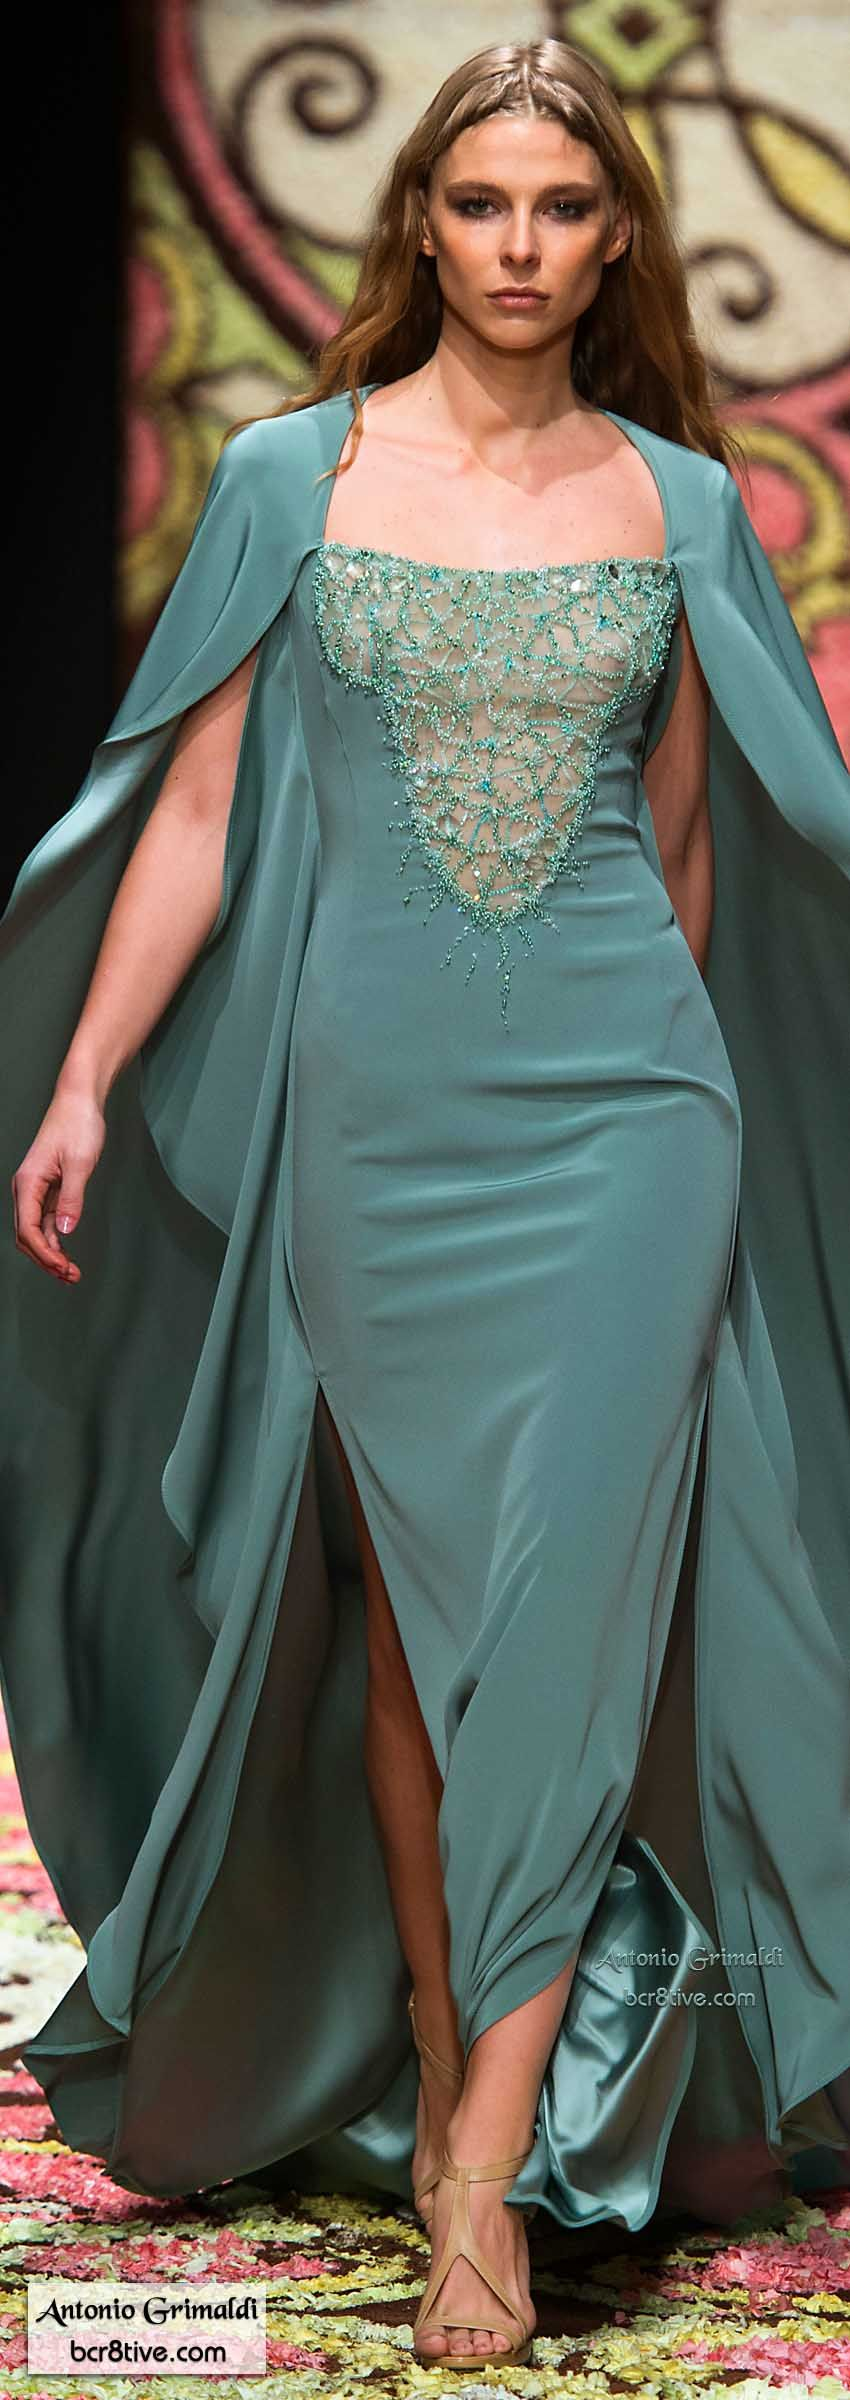 Antonio Grimaldi Spring 2015 Haute Couture jαɢlαdy